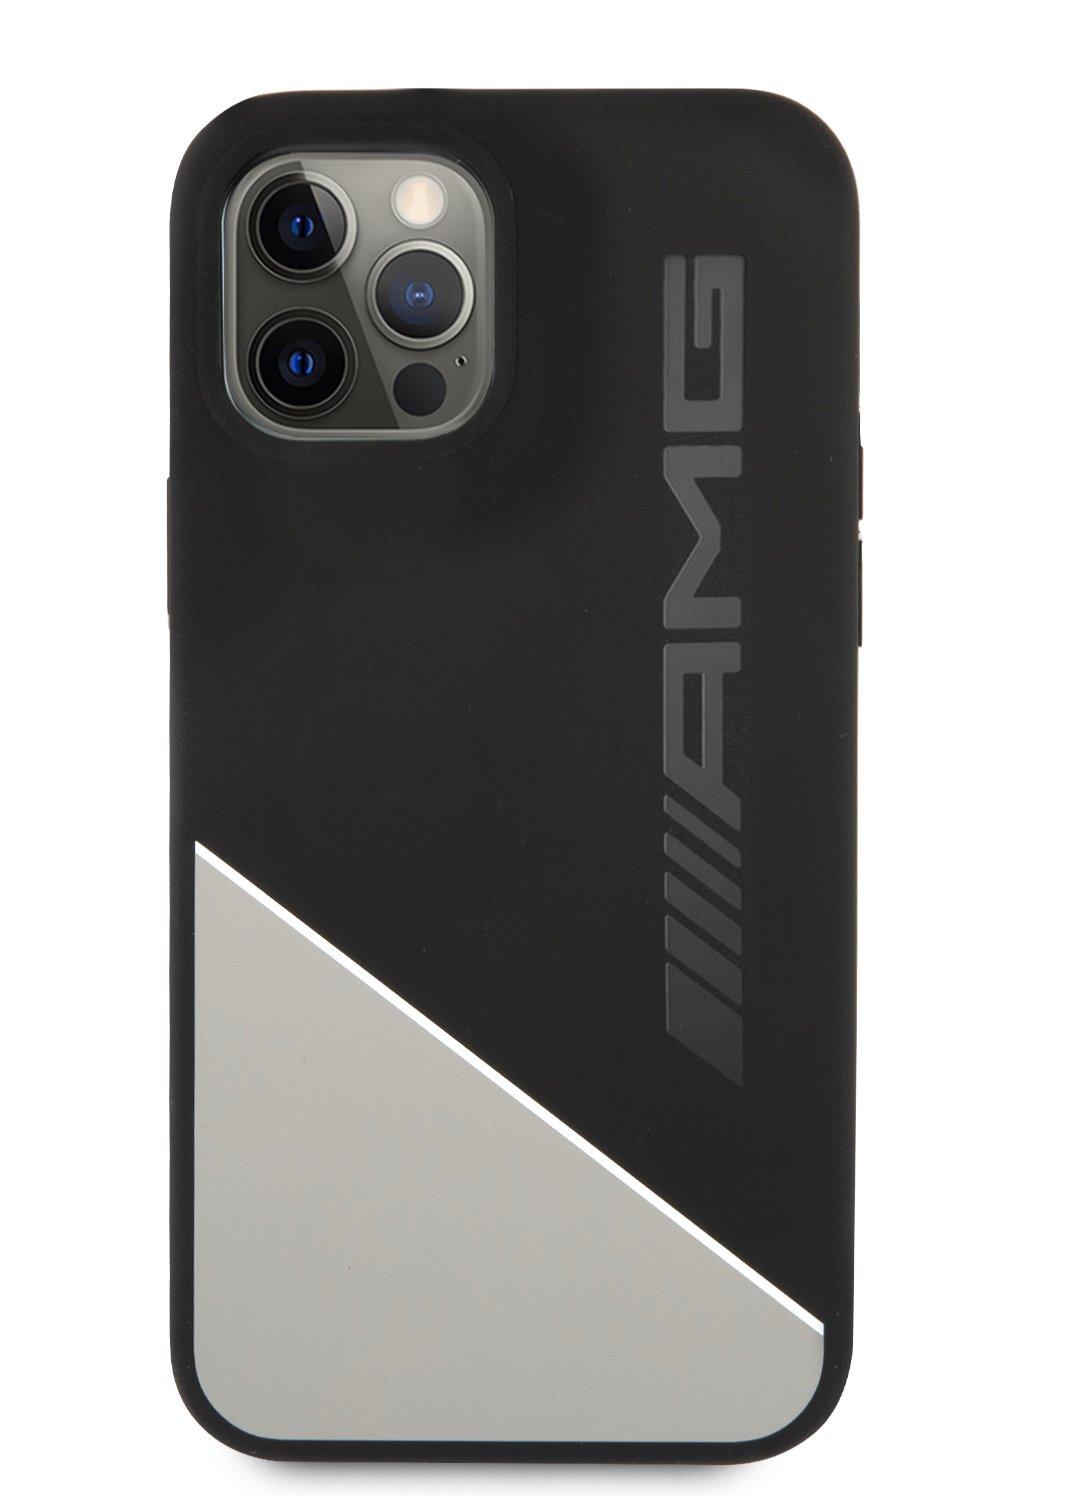 AMHCP12MWGDBK AMG Liquid Silicone Two Tones Kryt pro iPhone 12/12 Pro 6.1 Grey 3666339014056